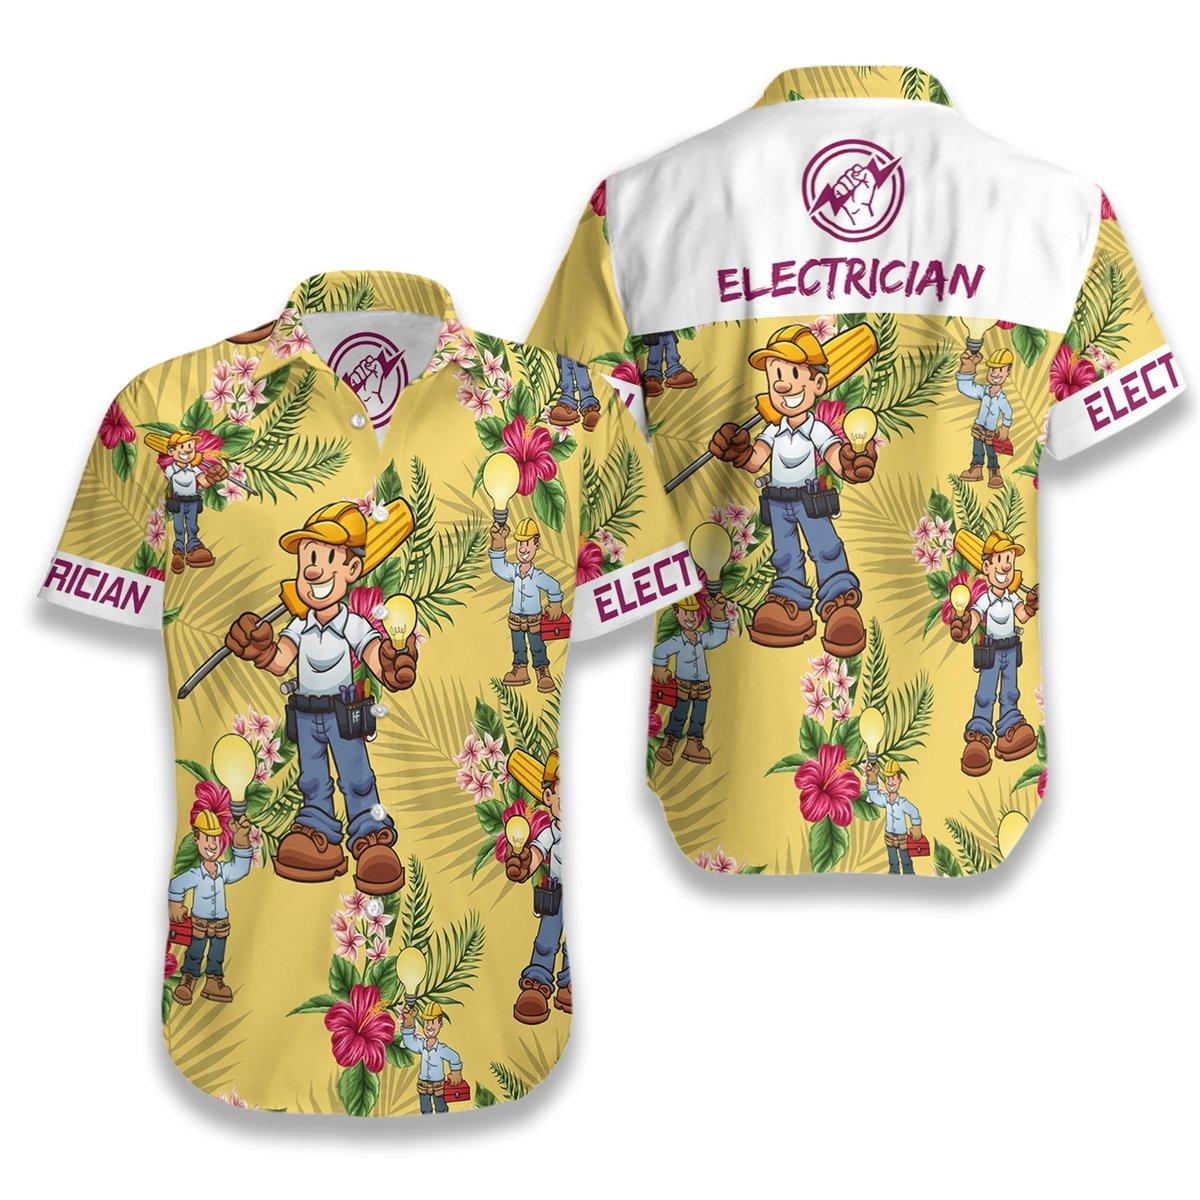 Electrician Hawaiian Shirt1